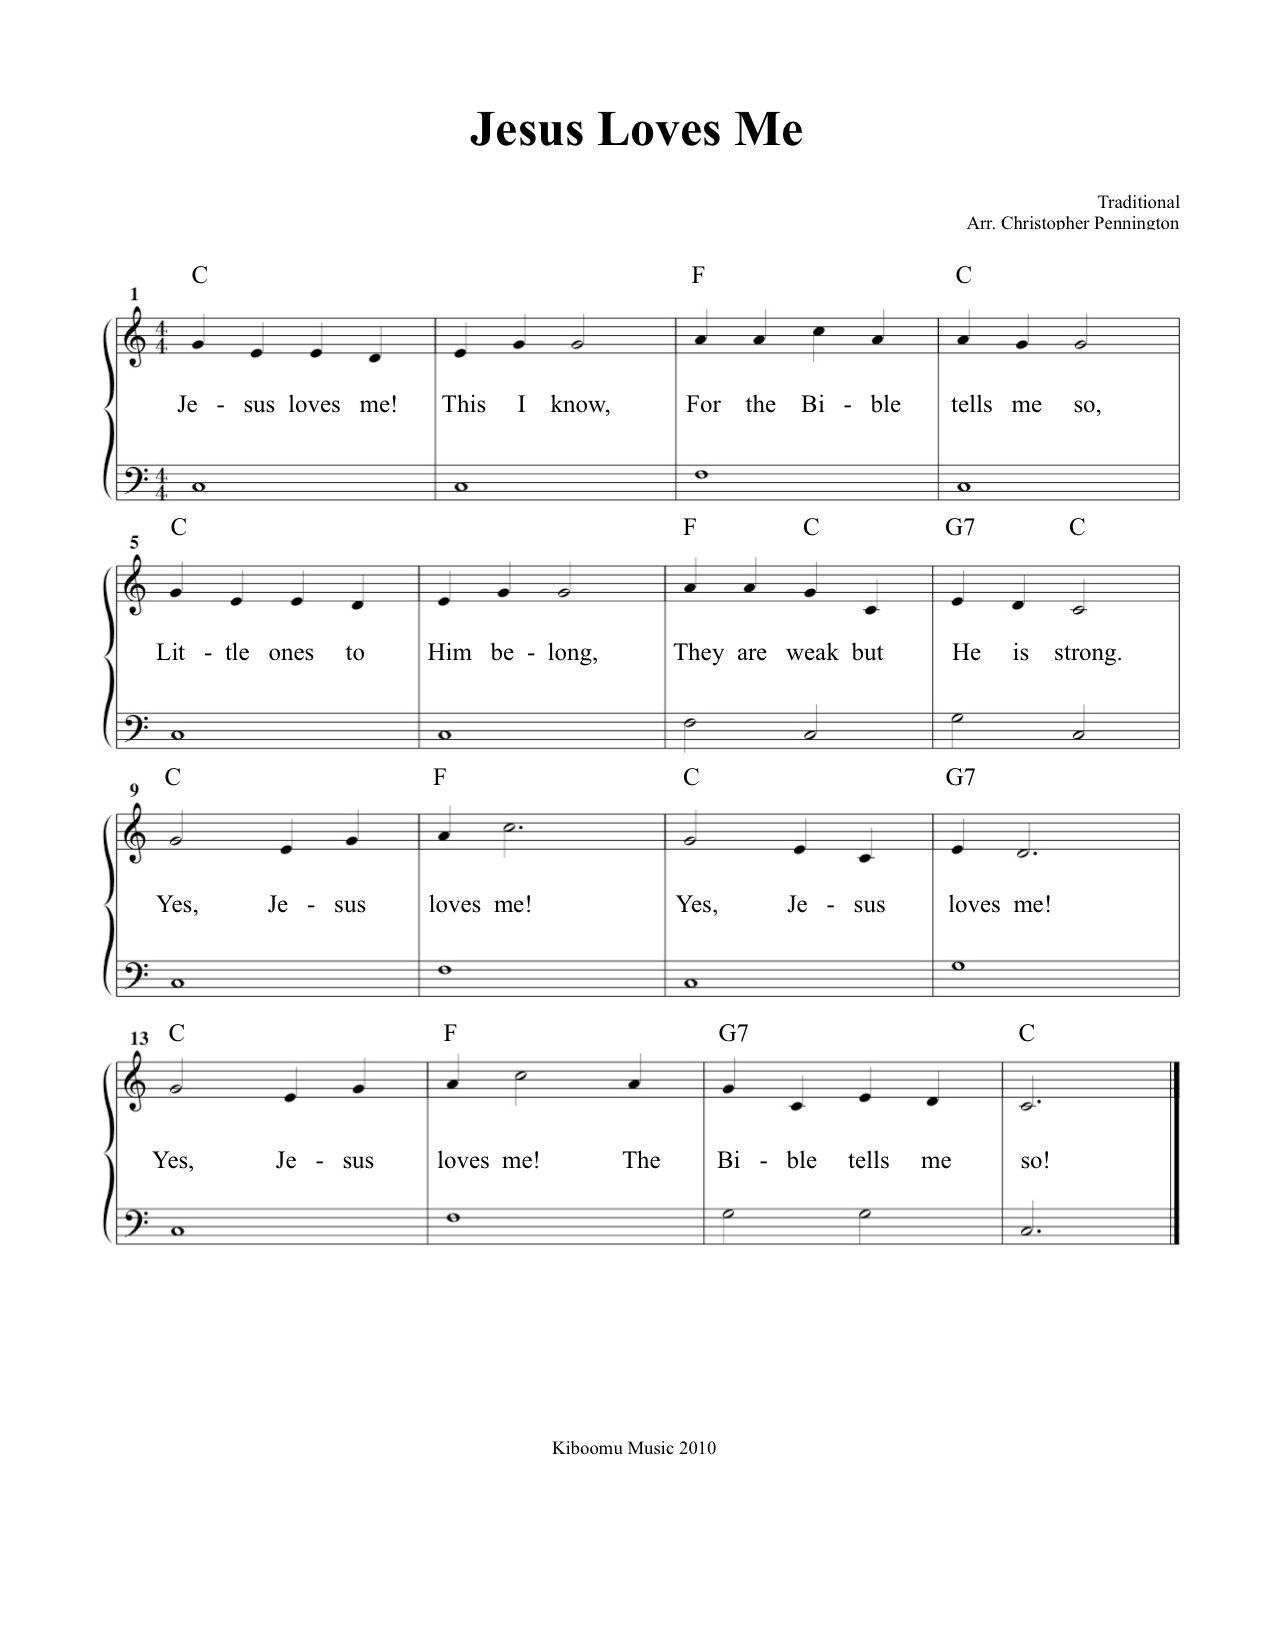 Jesus Loves Me Sheet Music Download Jesus Loves Me Sheet